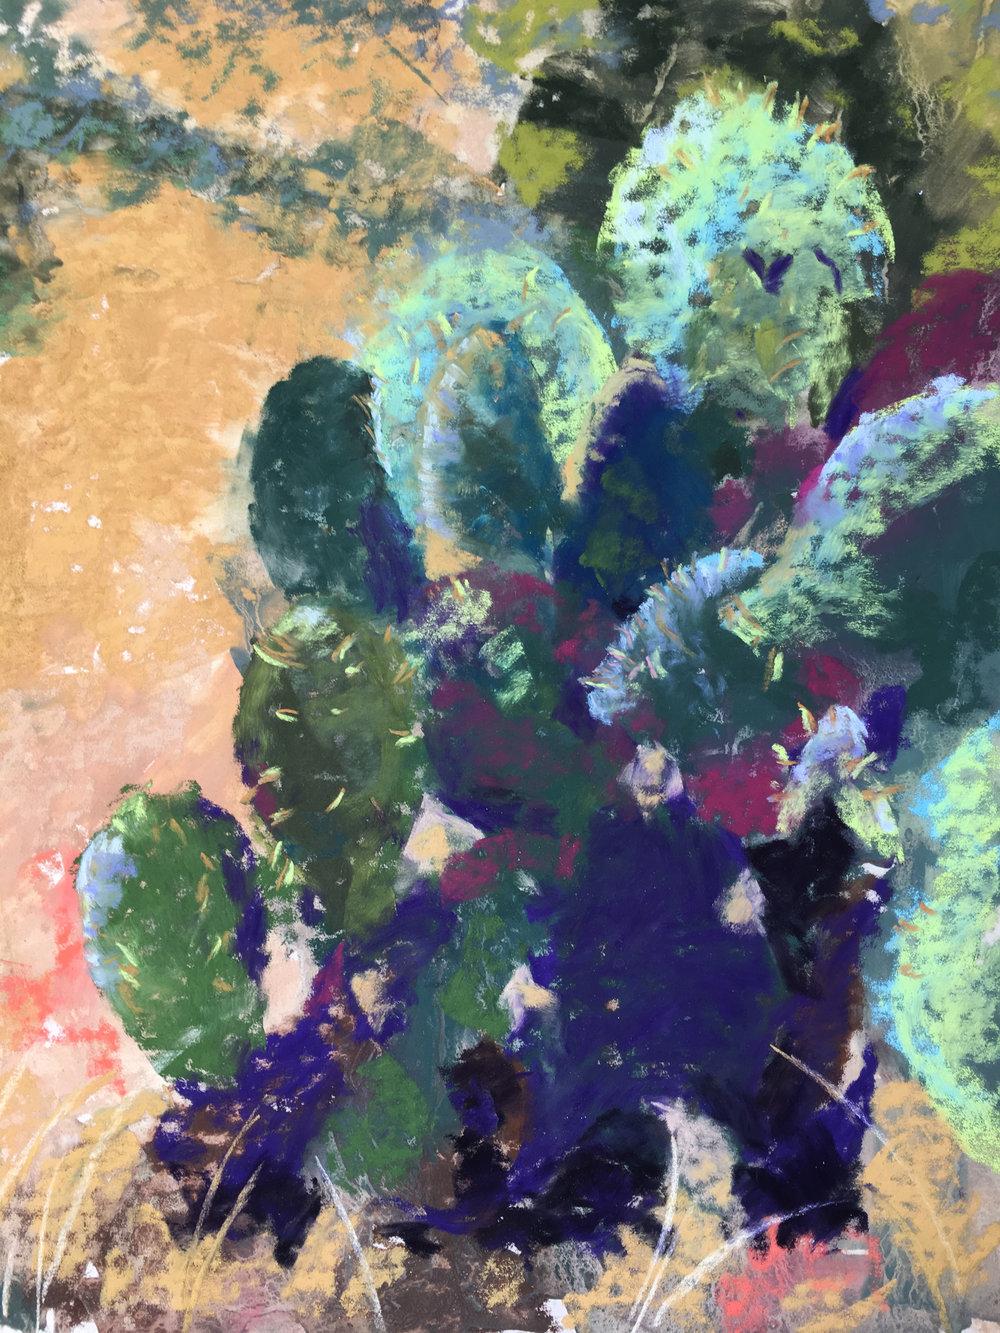 Barbara Naeser - b_naeser.jpg cactus.jpg